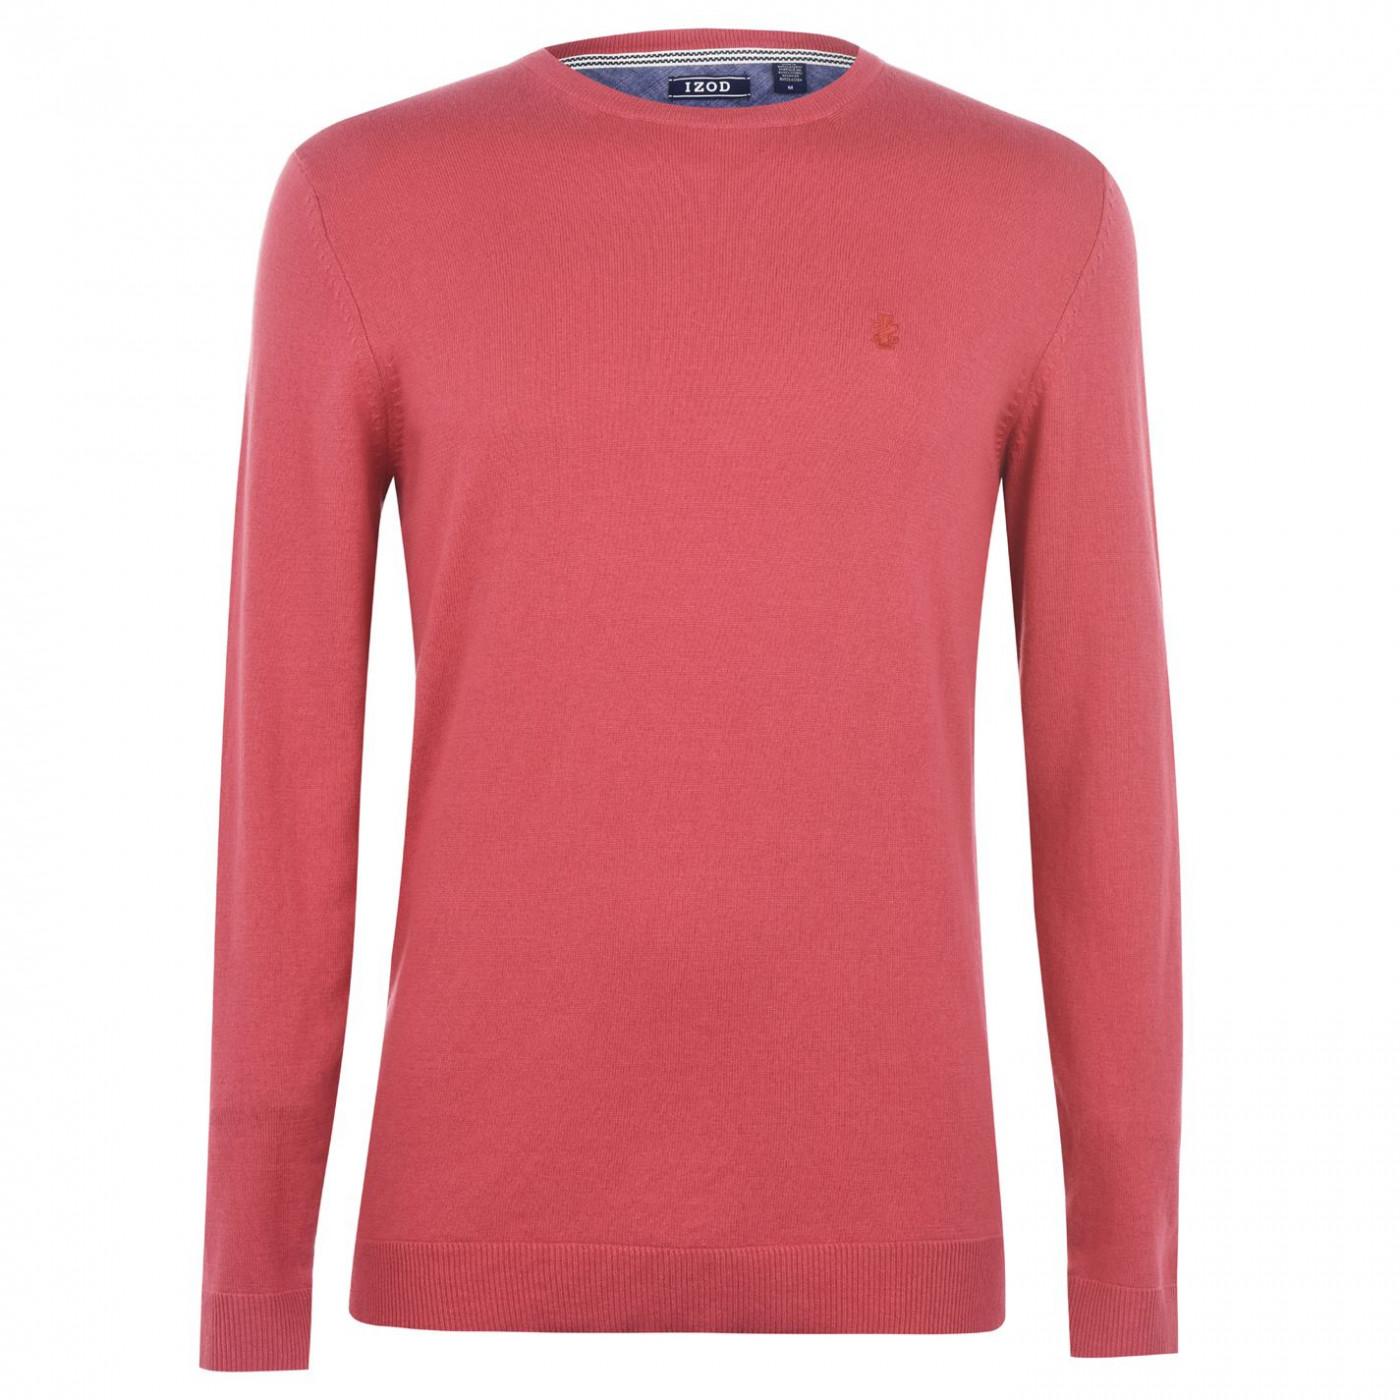 IZOD 12 GG Sweater